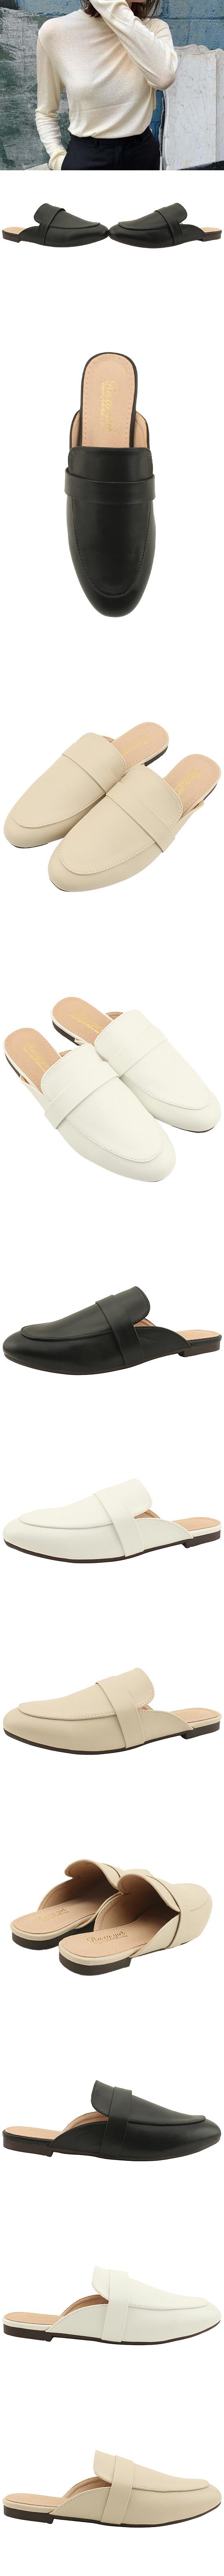 Basic Round Toe Flat Blocker White